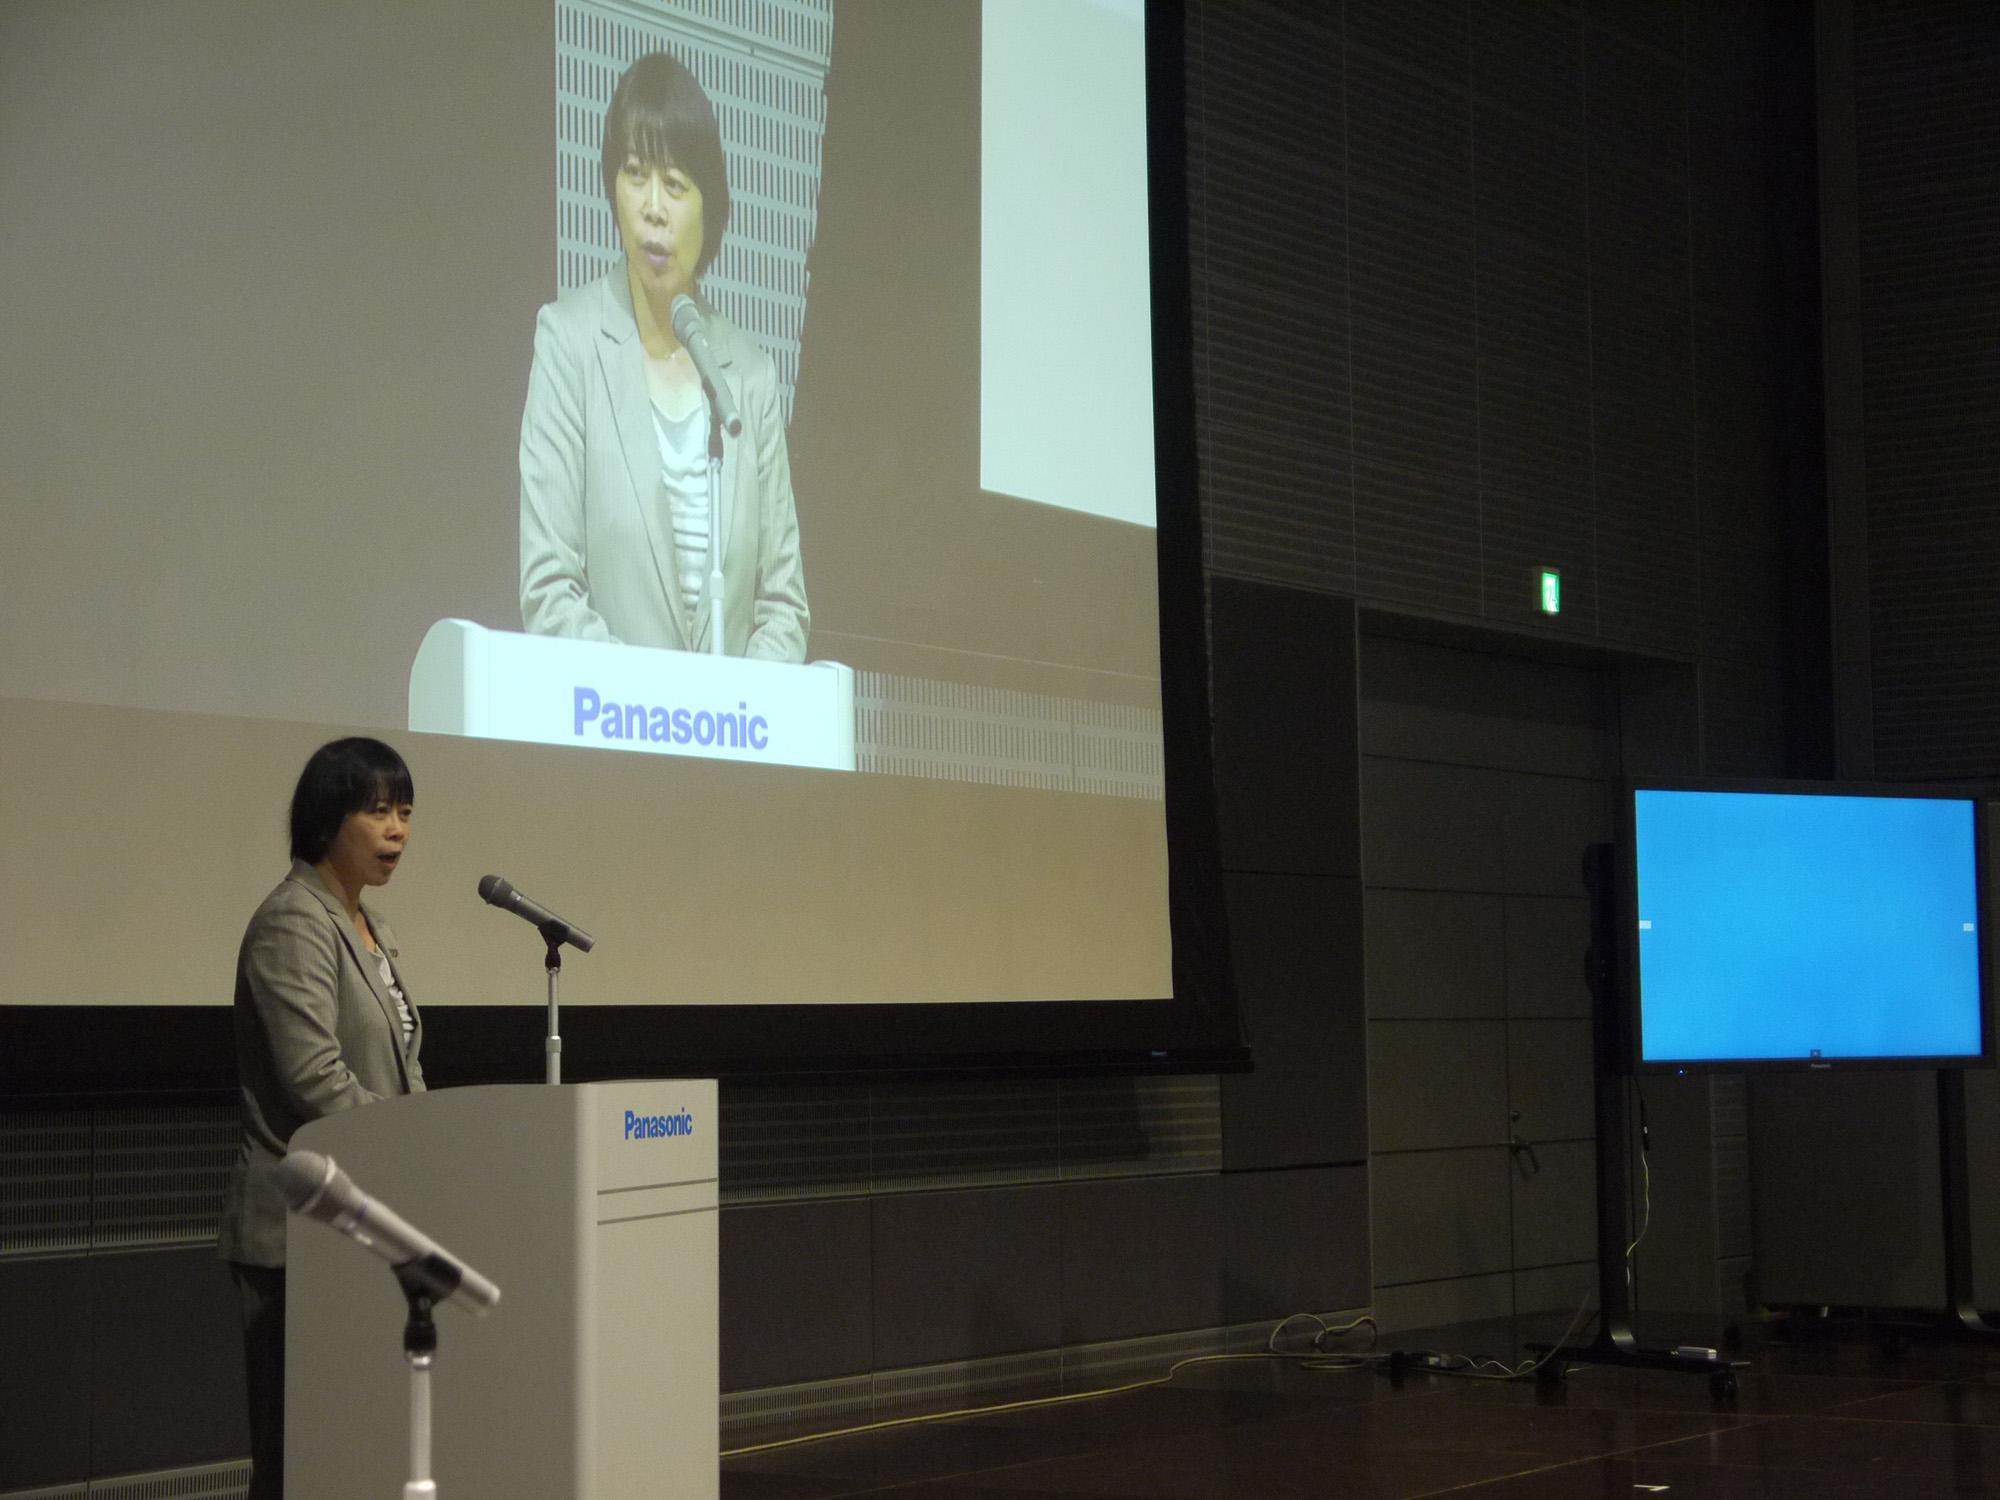 Teachers' セミナー スペシャル パナソニックによる新教材発表(1)